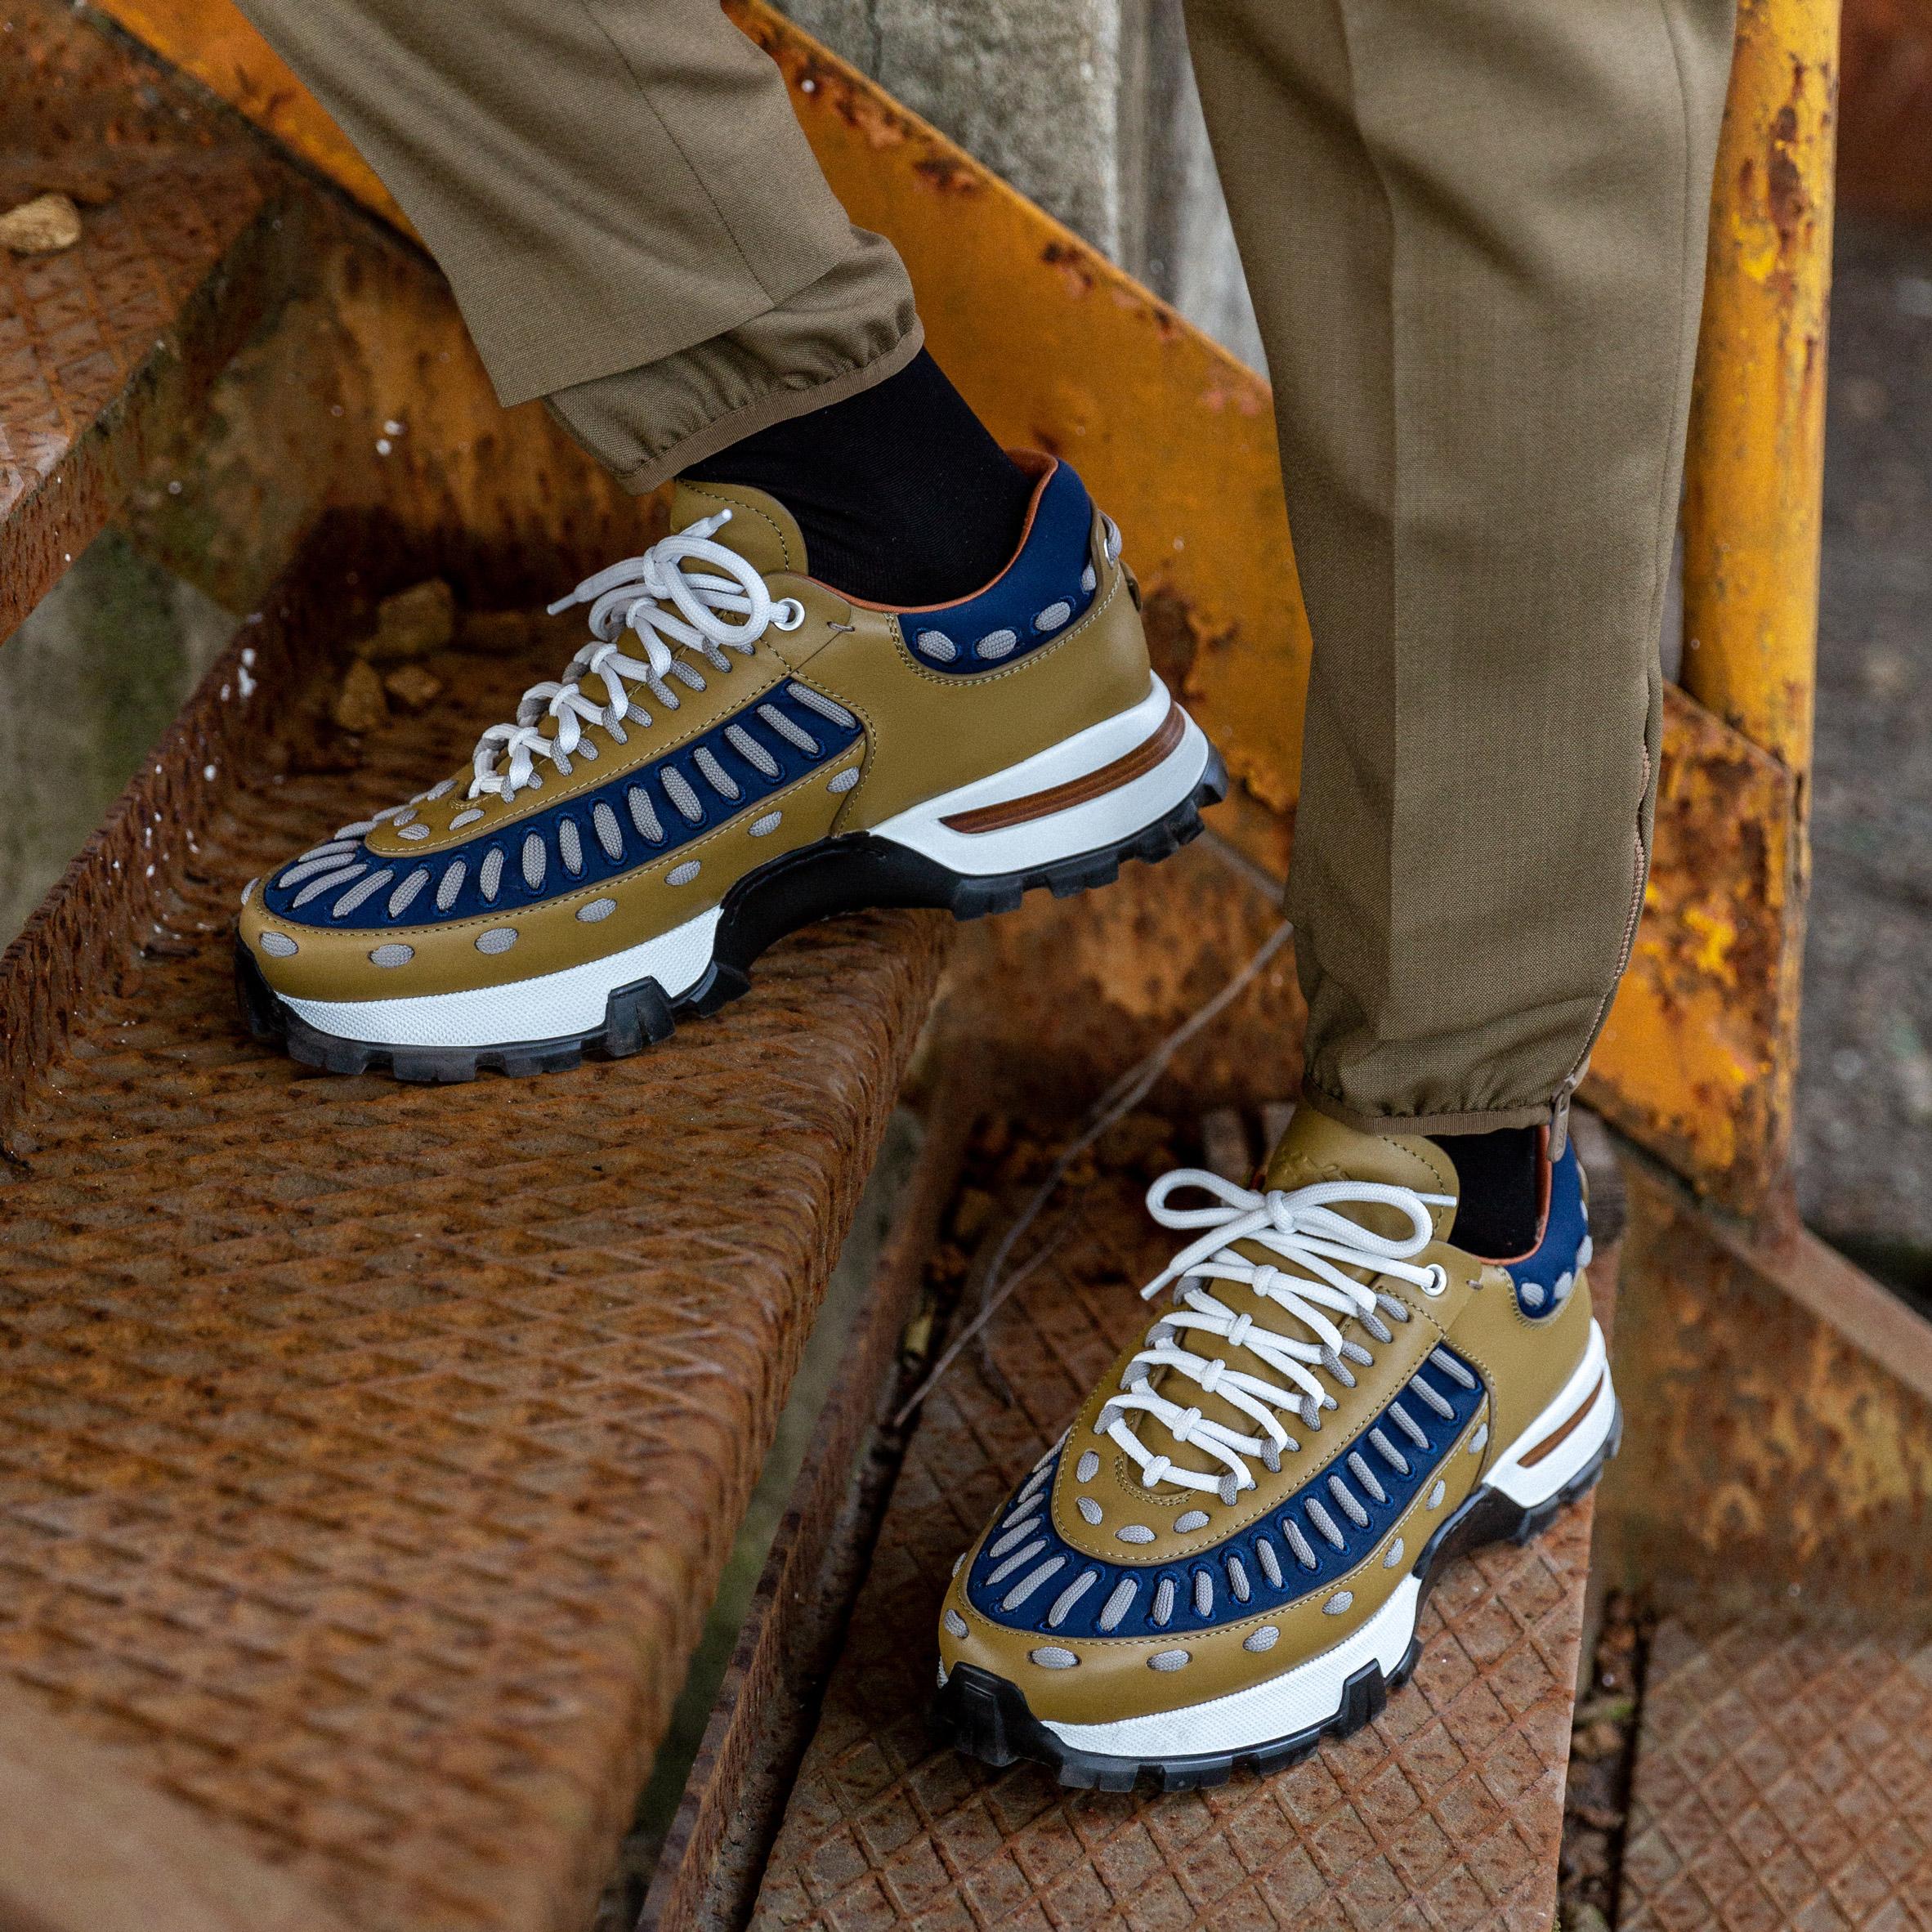 7af5b12c Ermenegildo Zegna releases latest customisable sneaker My Claudio